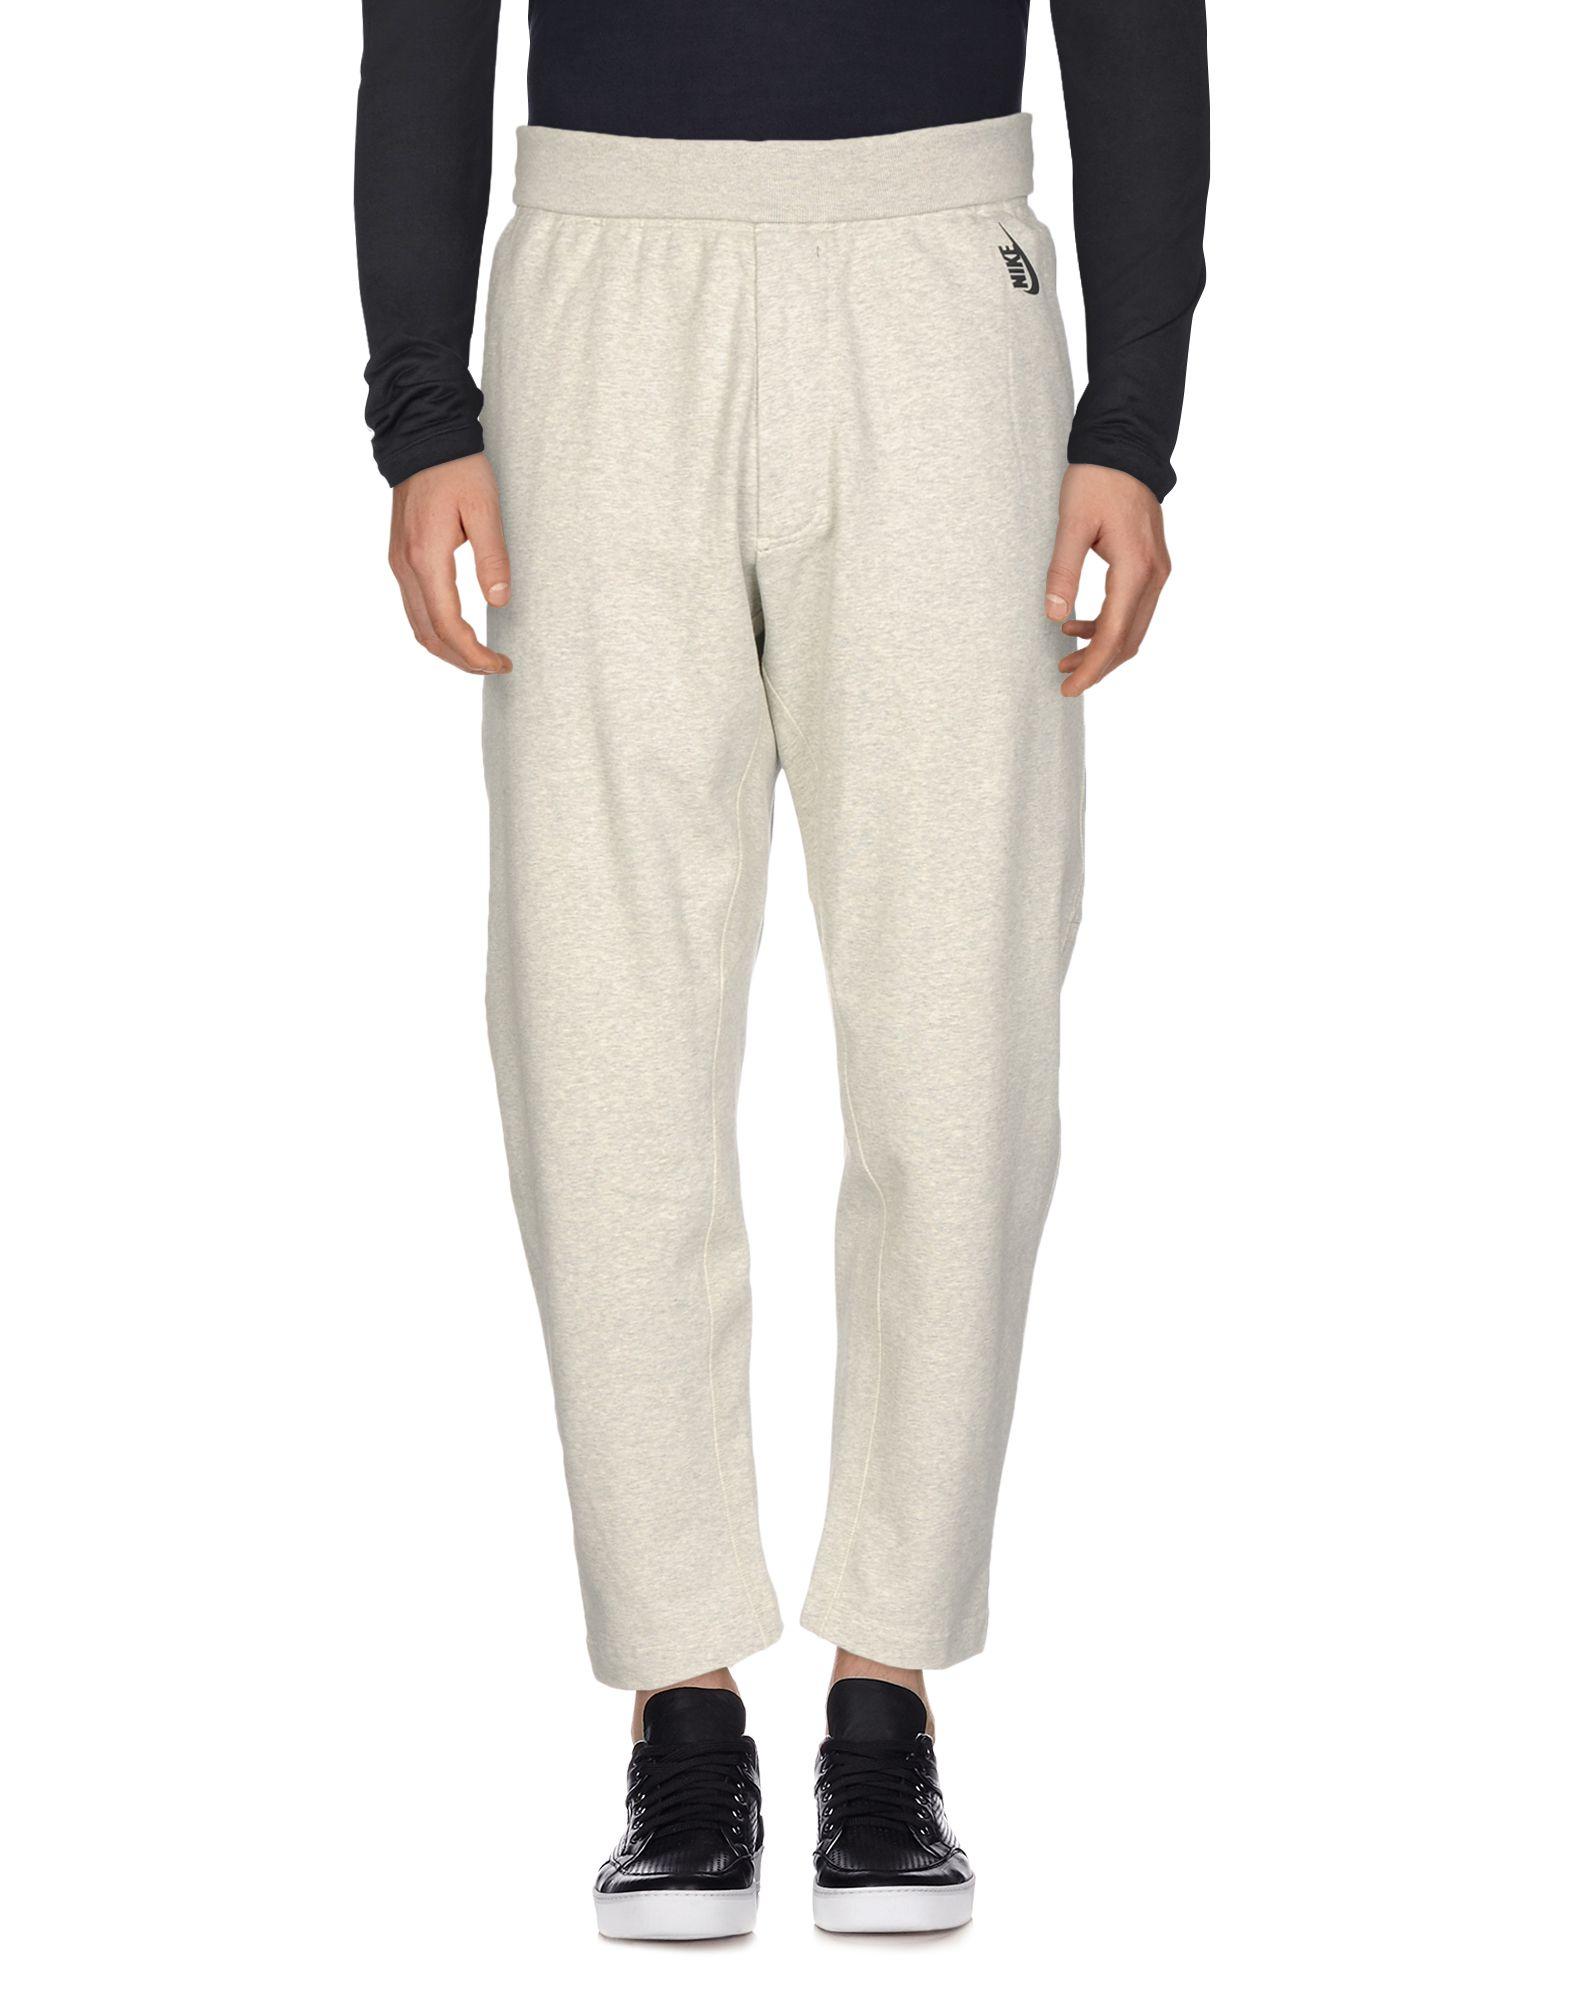 Pantalone Nike Donna - Acquista online su